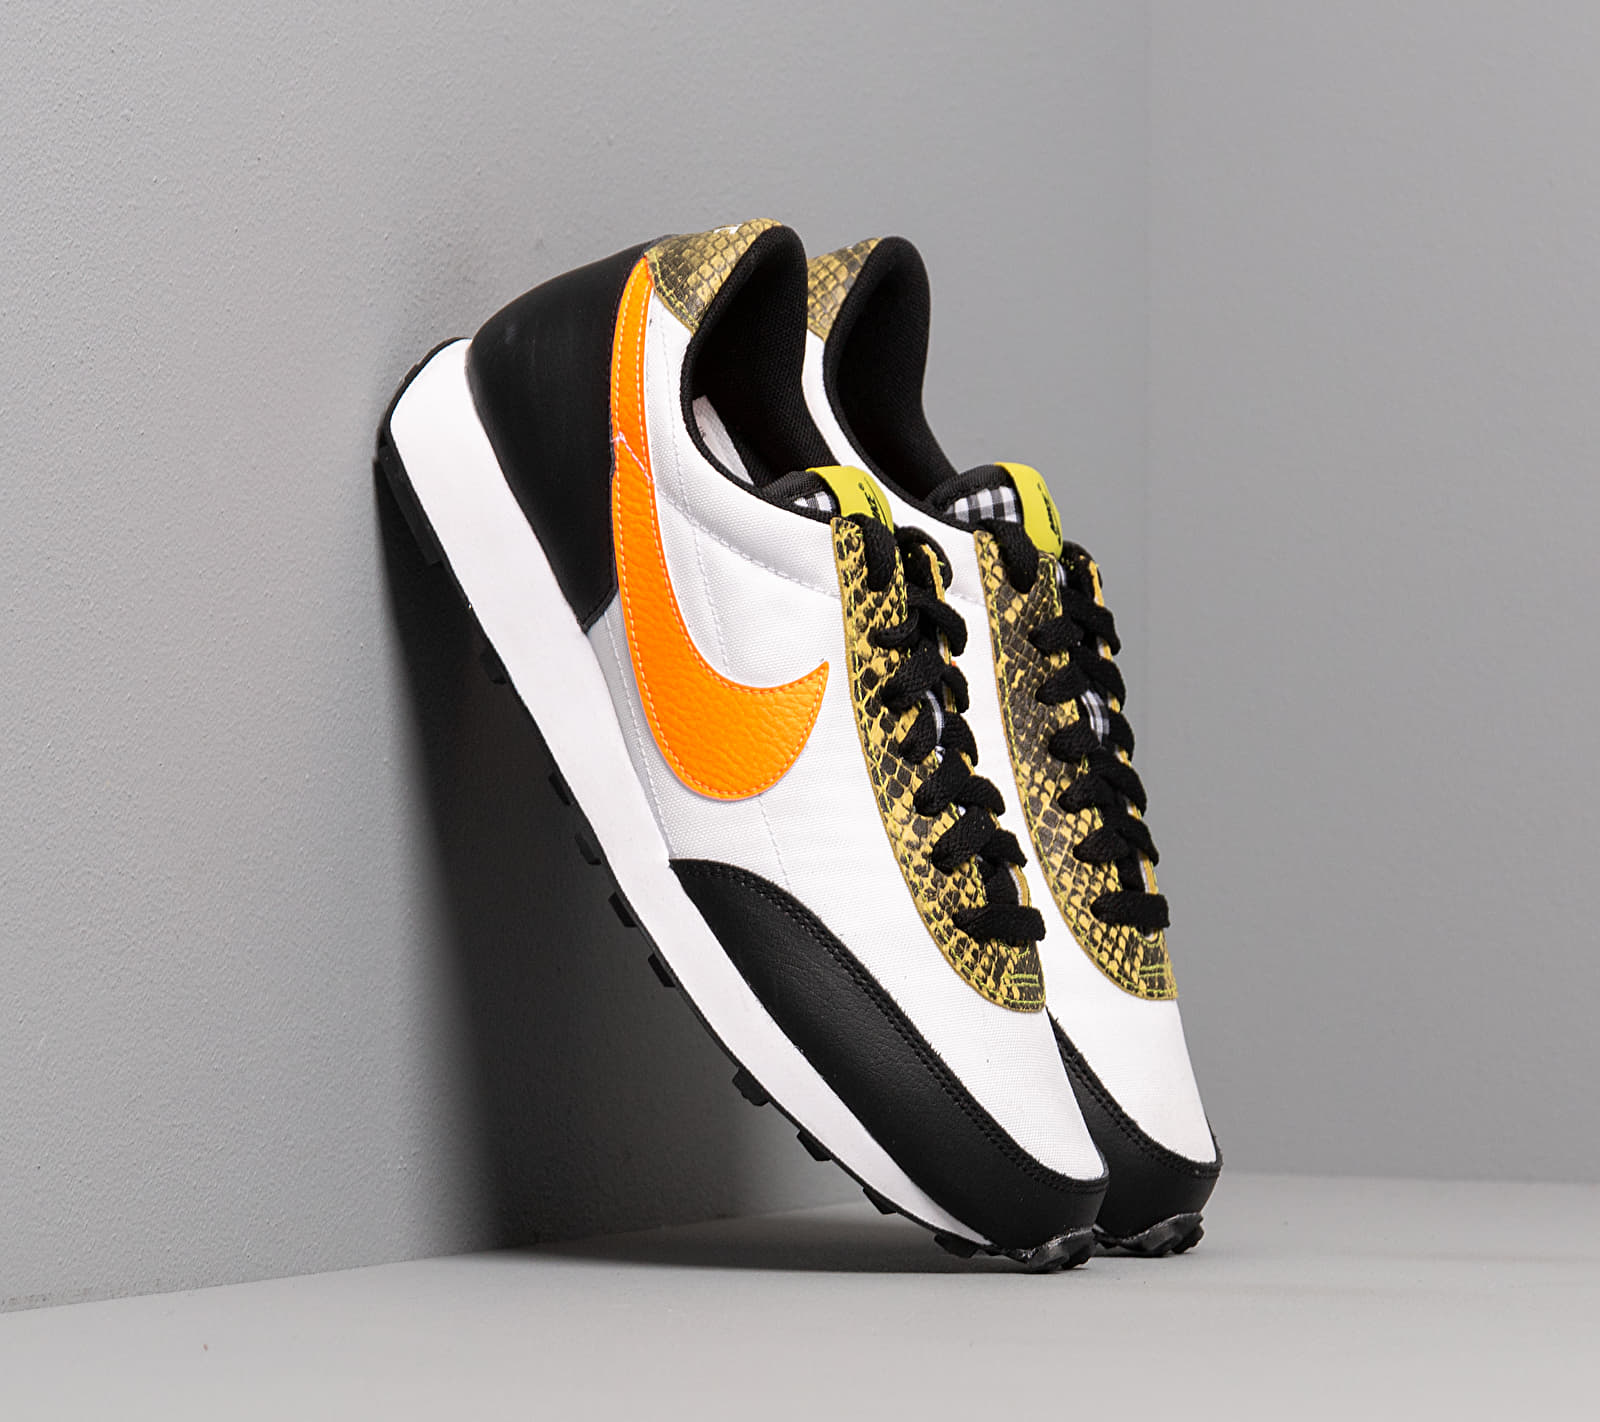 Nike W Daybreak QS Black/ Total Orange-Dynamic Yellow-White EUR 40.5